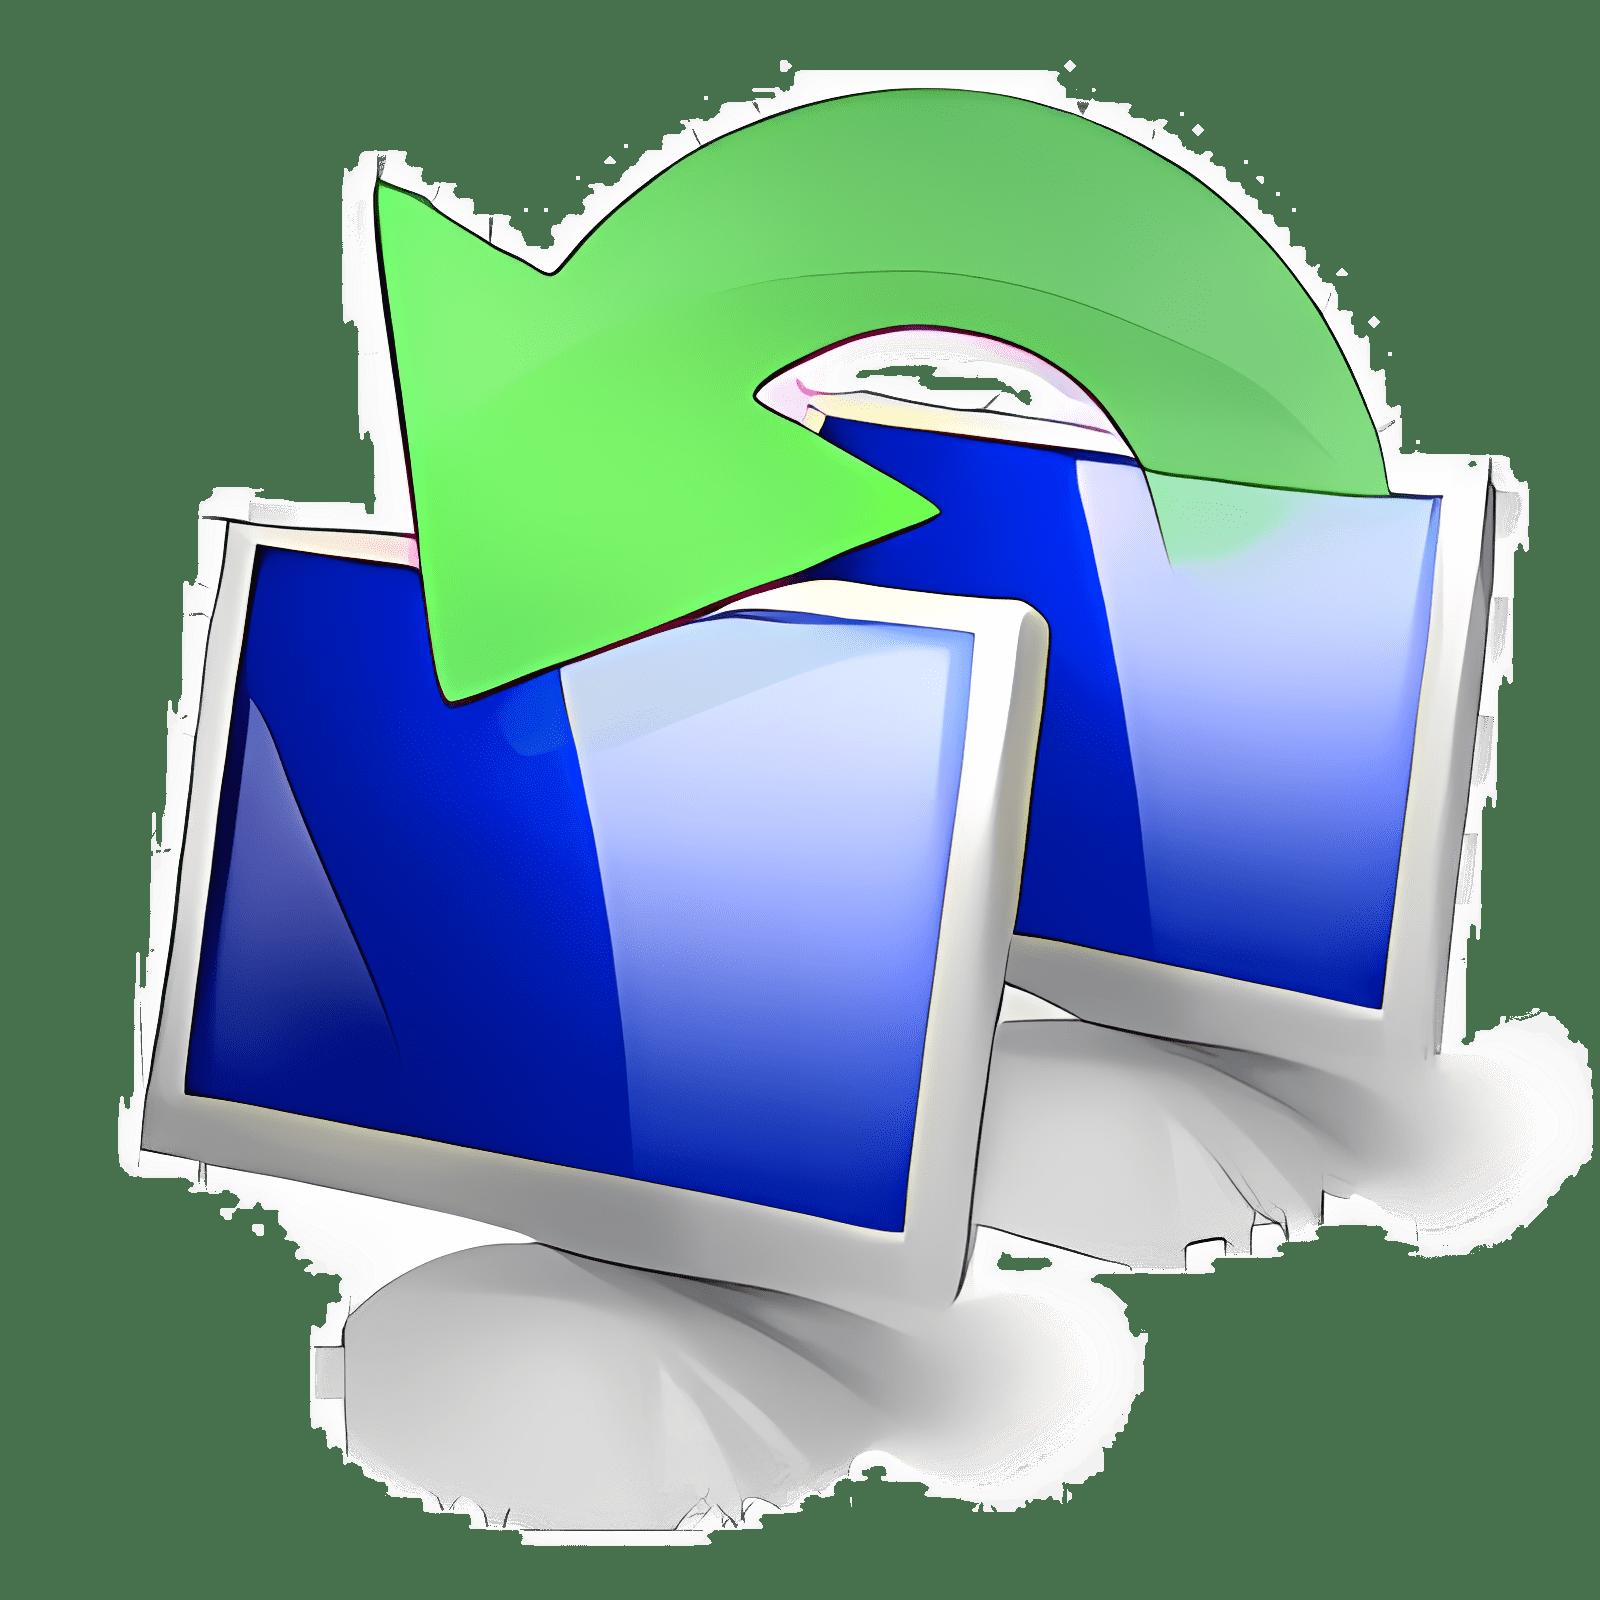 Windows 7 Easy Transfer